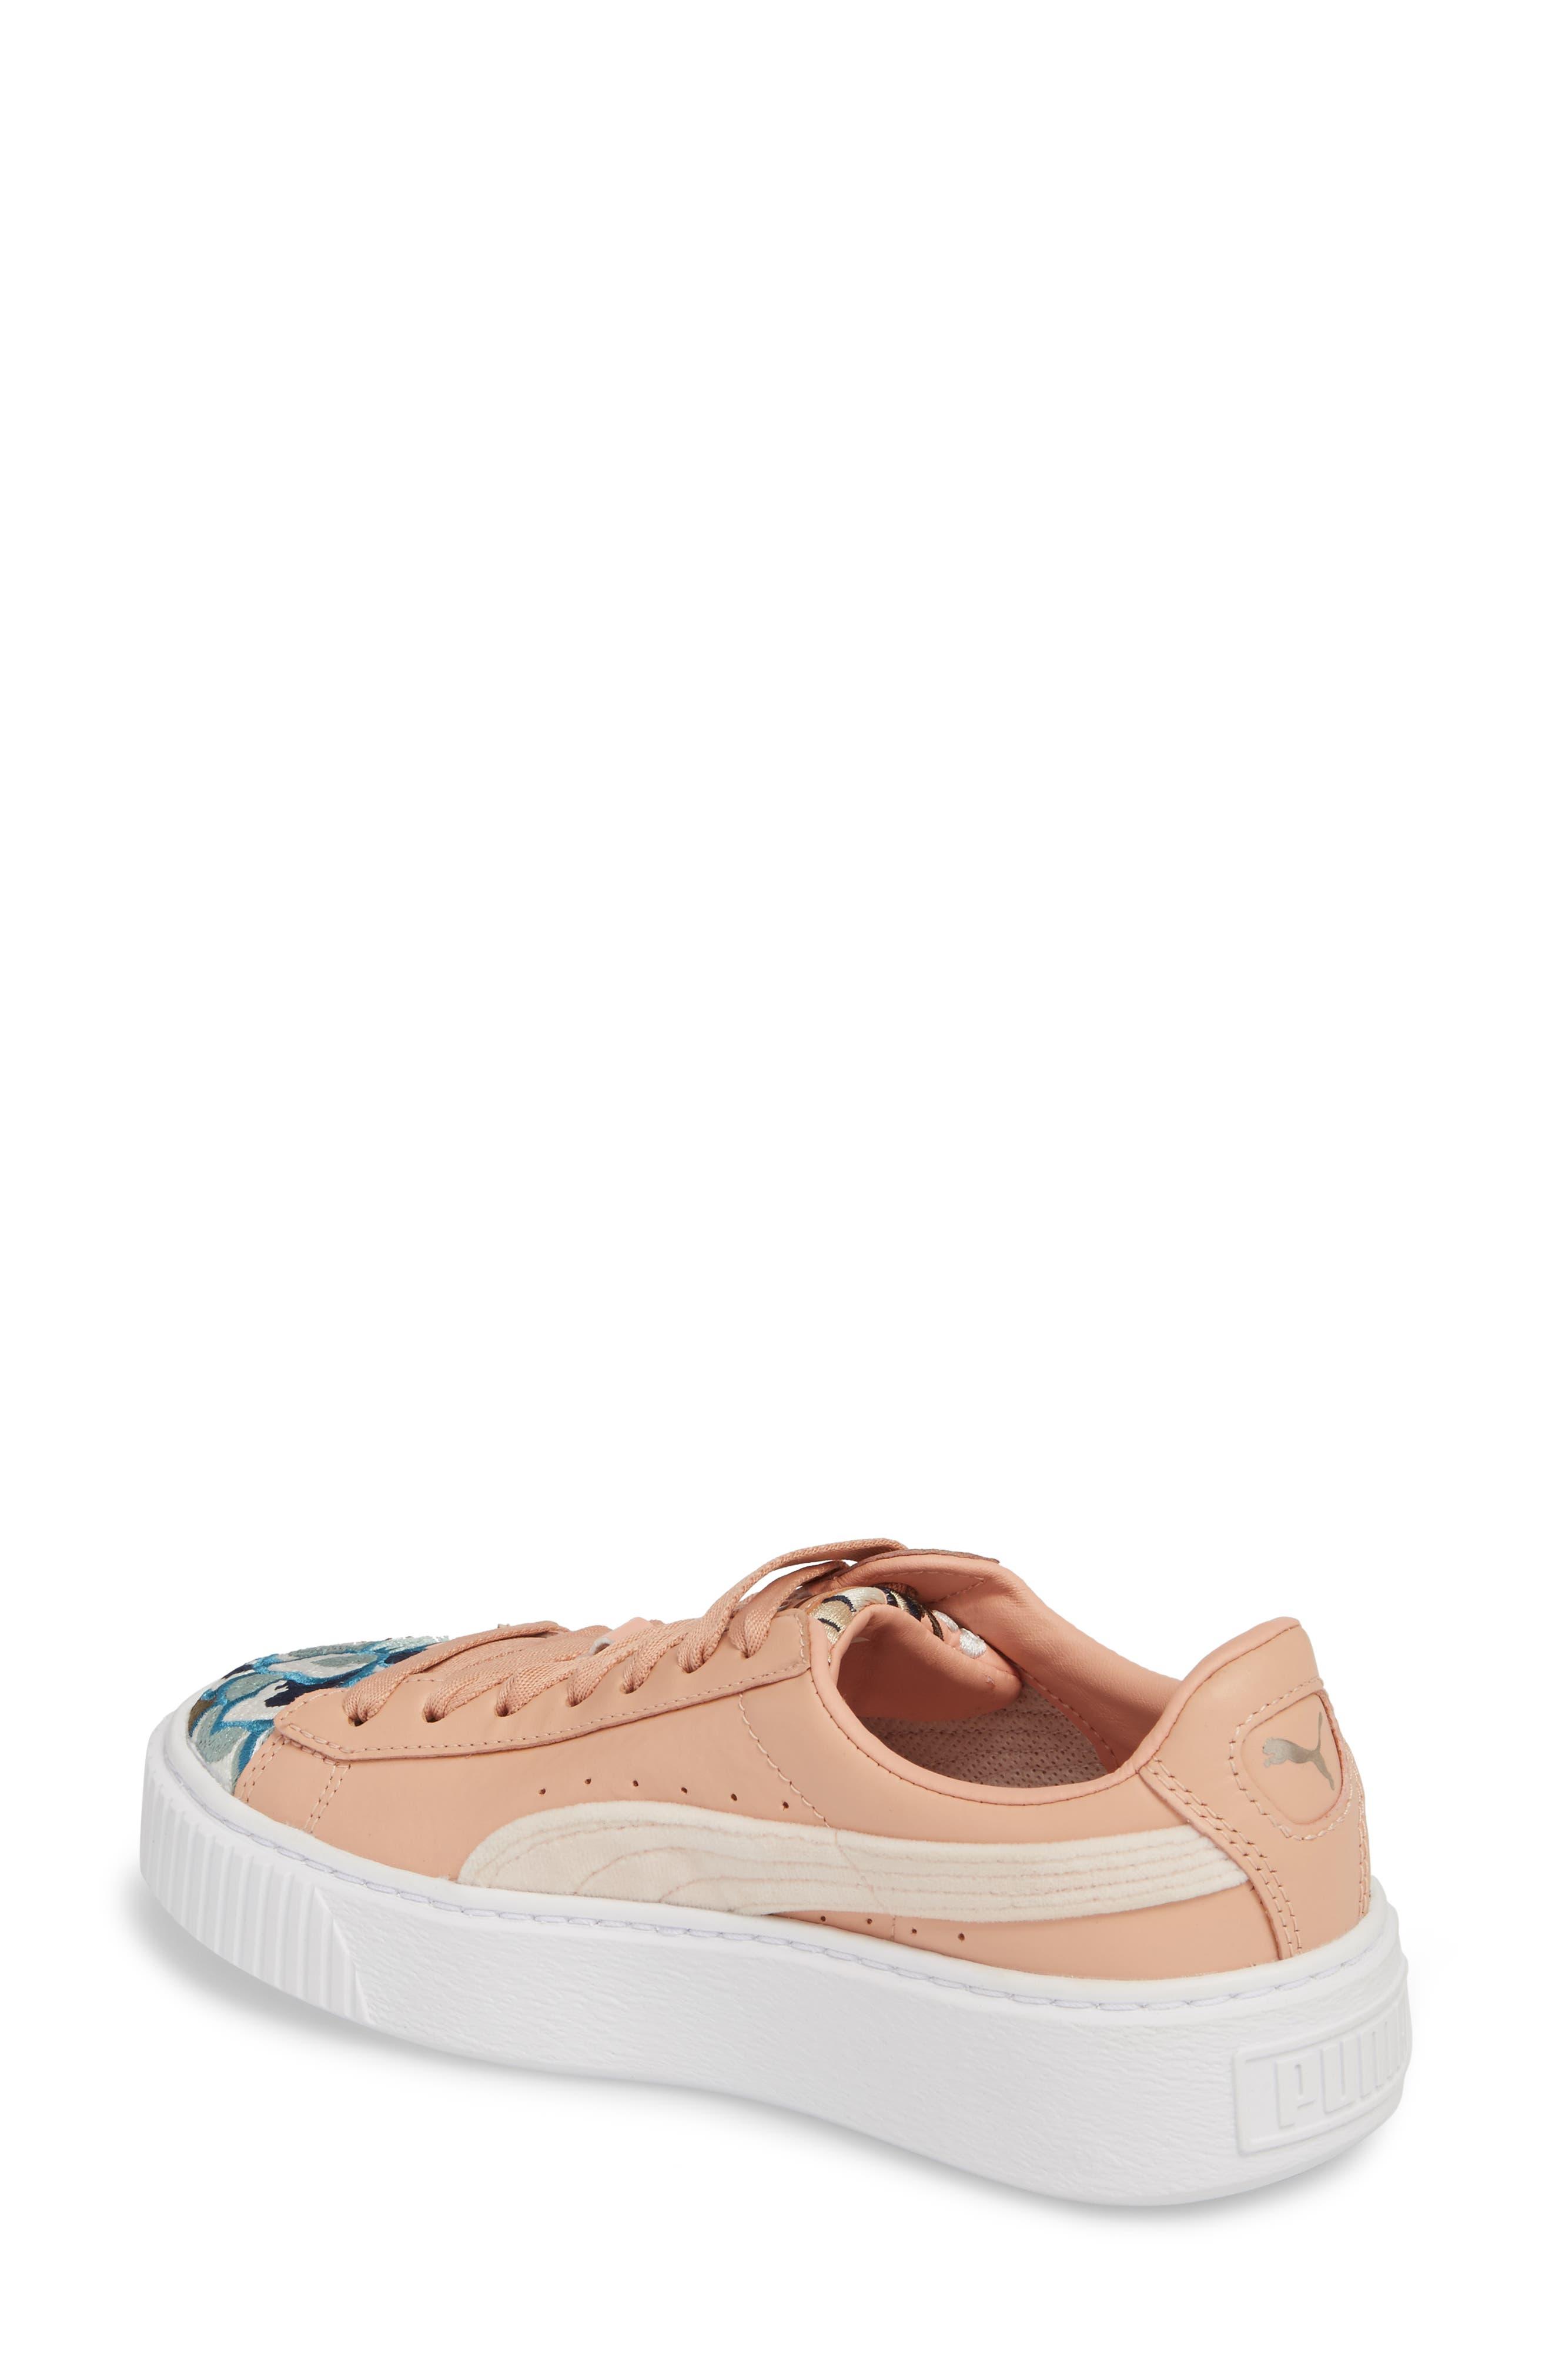 Platform Hyper Embroidered Sneaker,                             Alternate thumbnail 2, color,                             Peach Beige